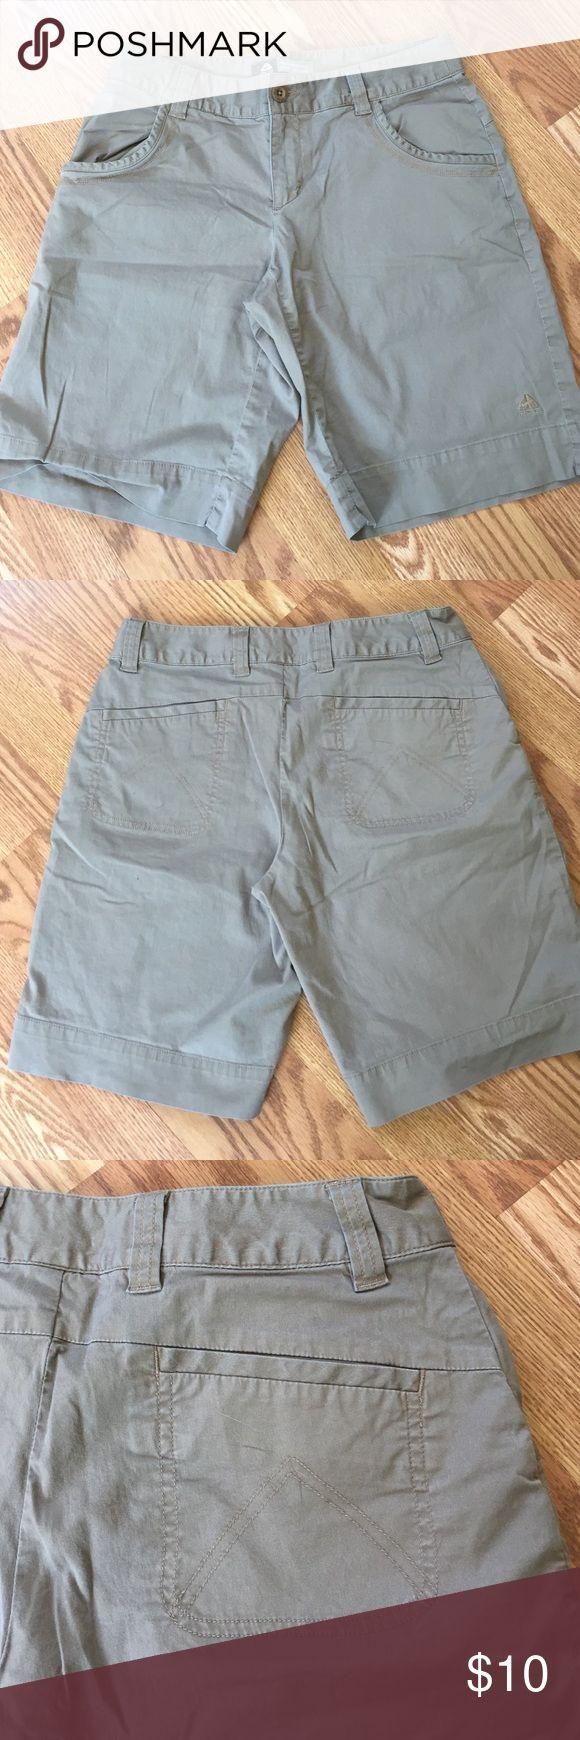 Nike shorts. Good for hiking. Bermuda length. Size 4. Casual walking or hiking shorts. Nike Shorts Bermudas